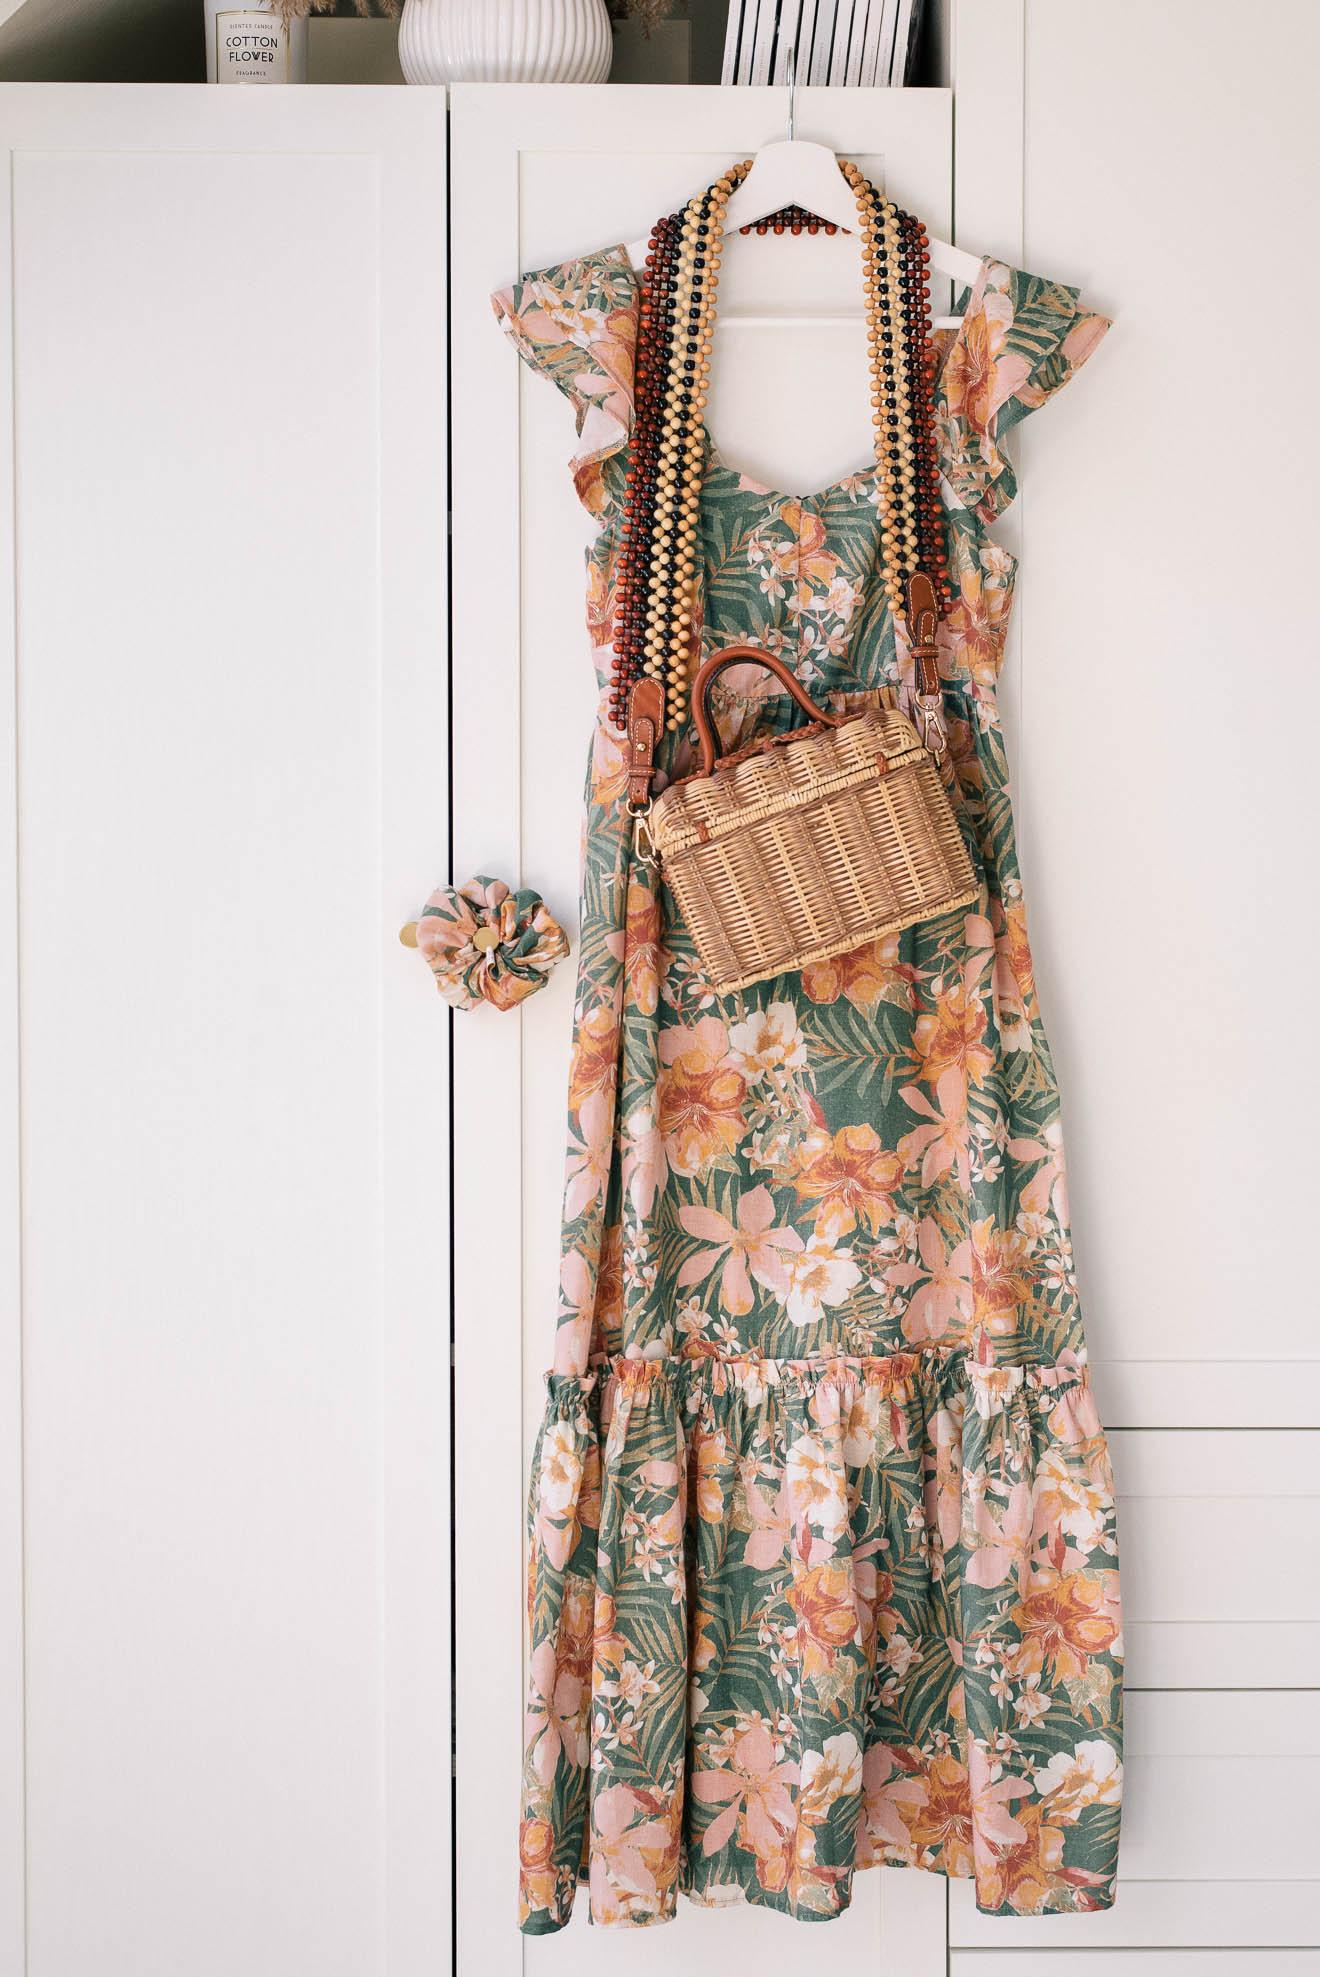 Gloria dress by Denina Martin 2021